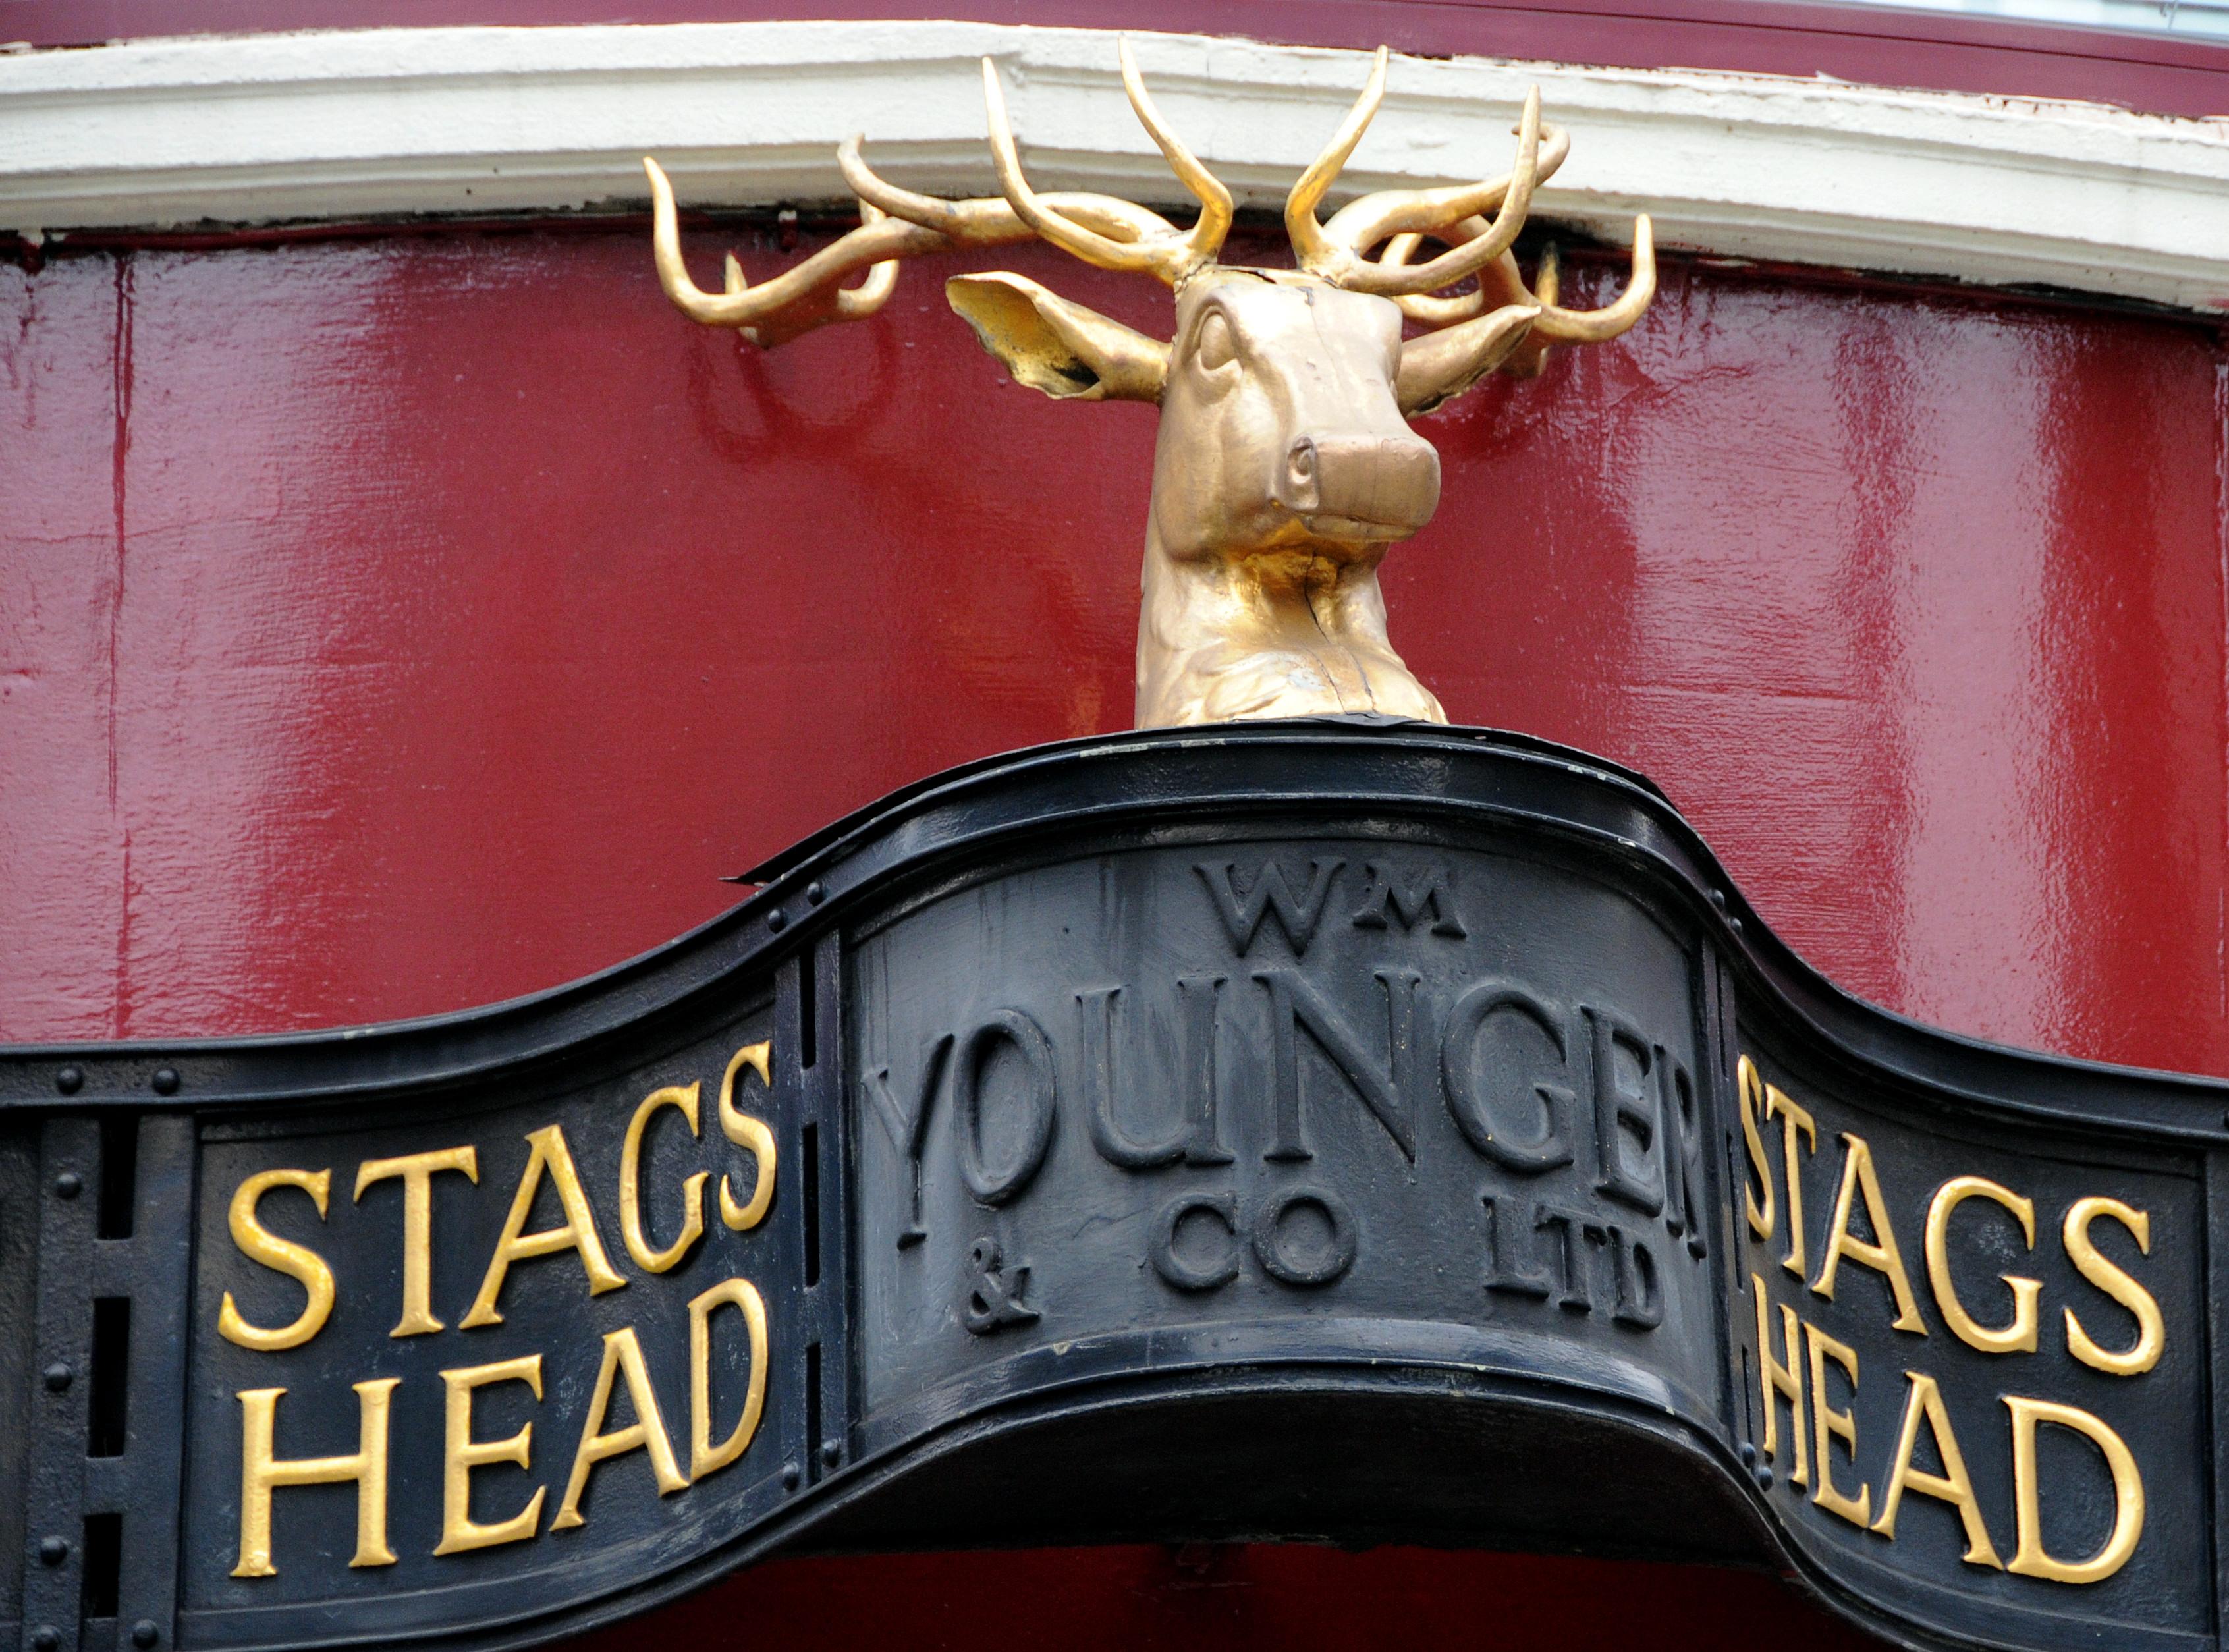 Stags Head, 102 New Cavendish Street.